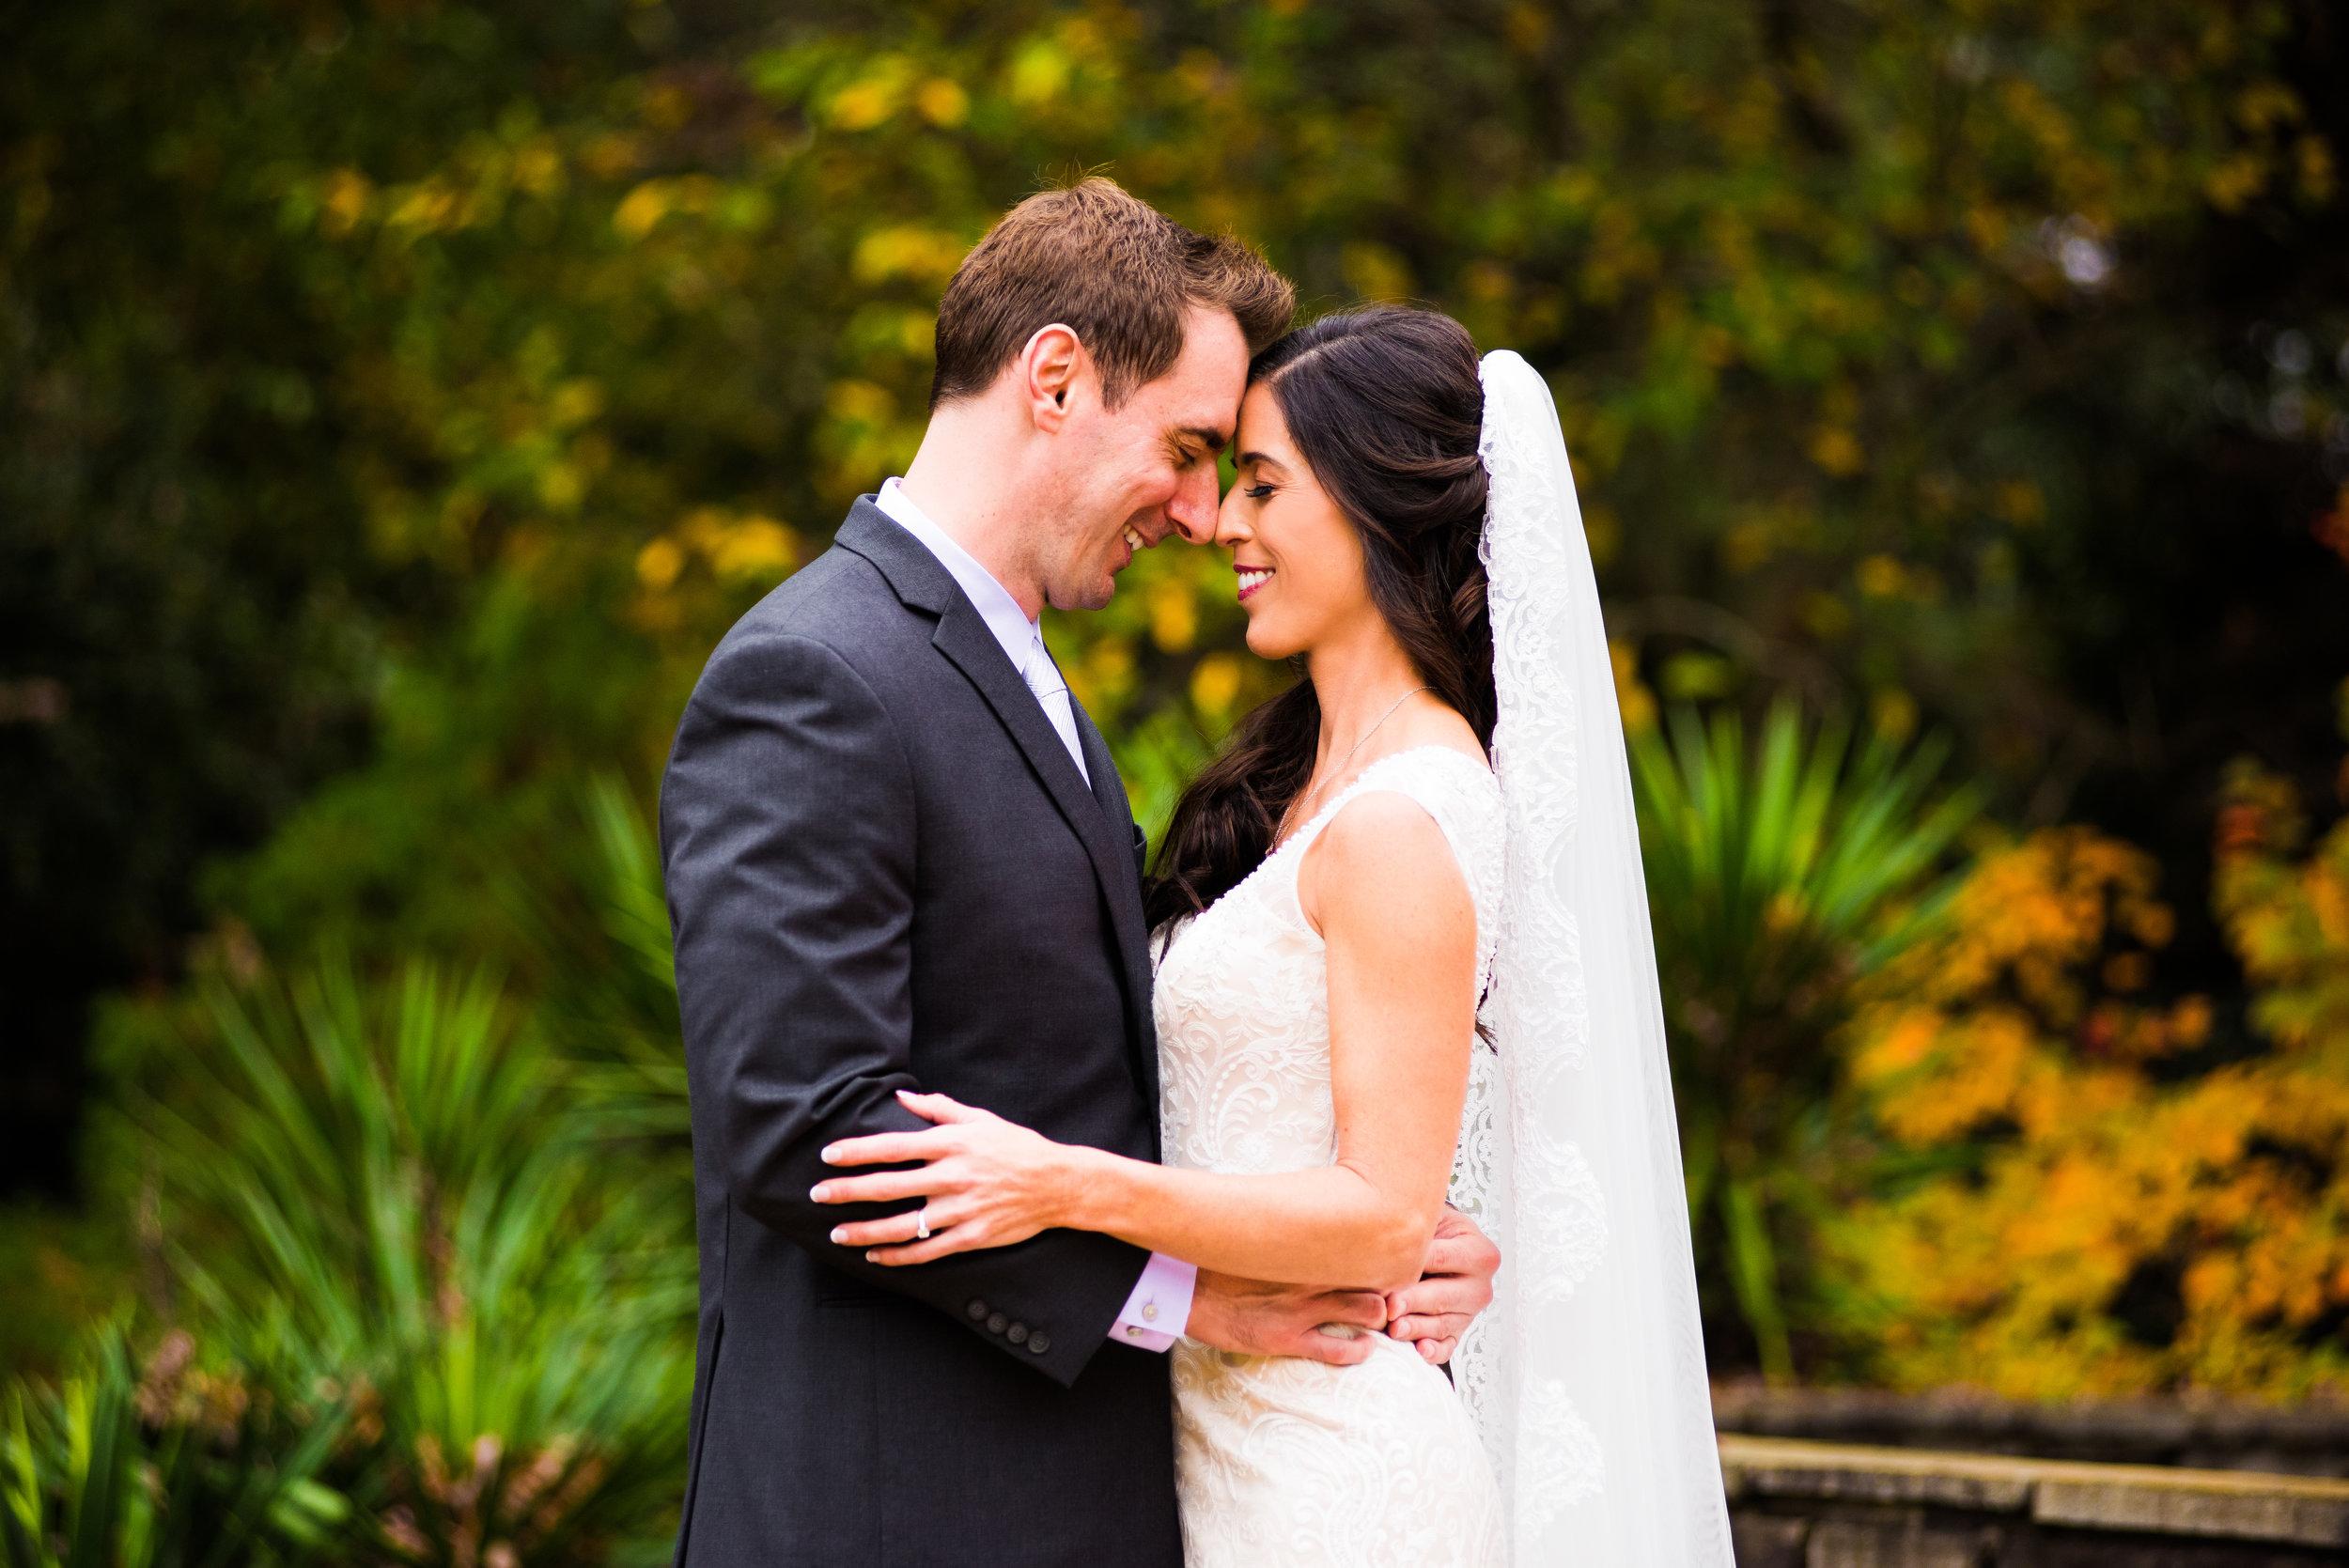 Heather & Lincoln Groves Wedding SP WEB_36.jpg